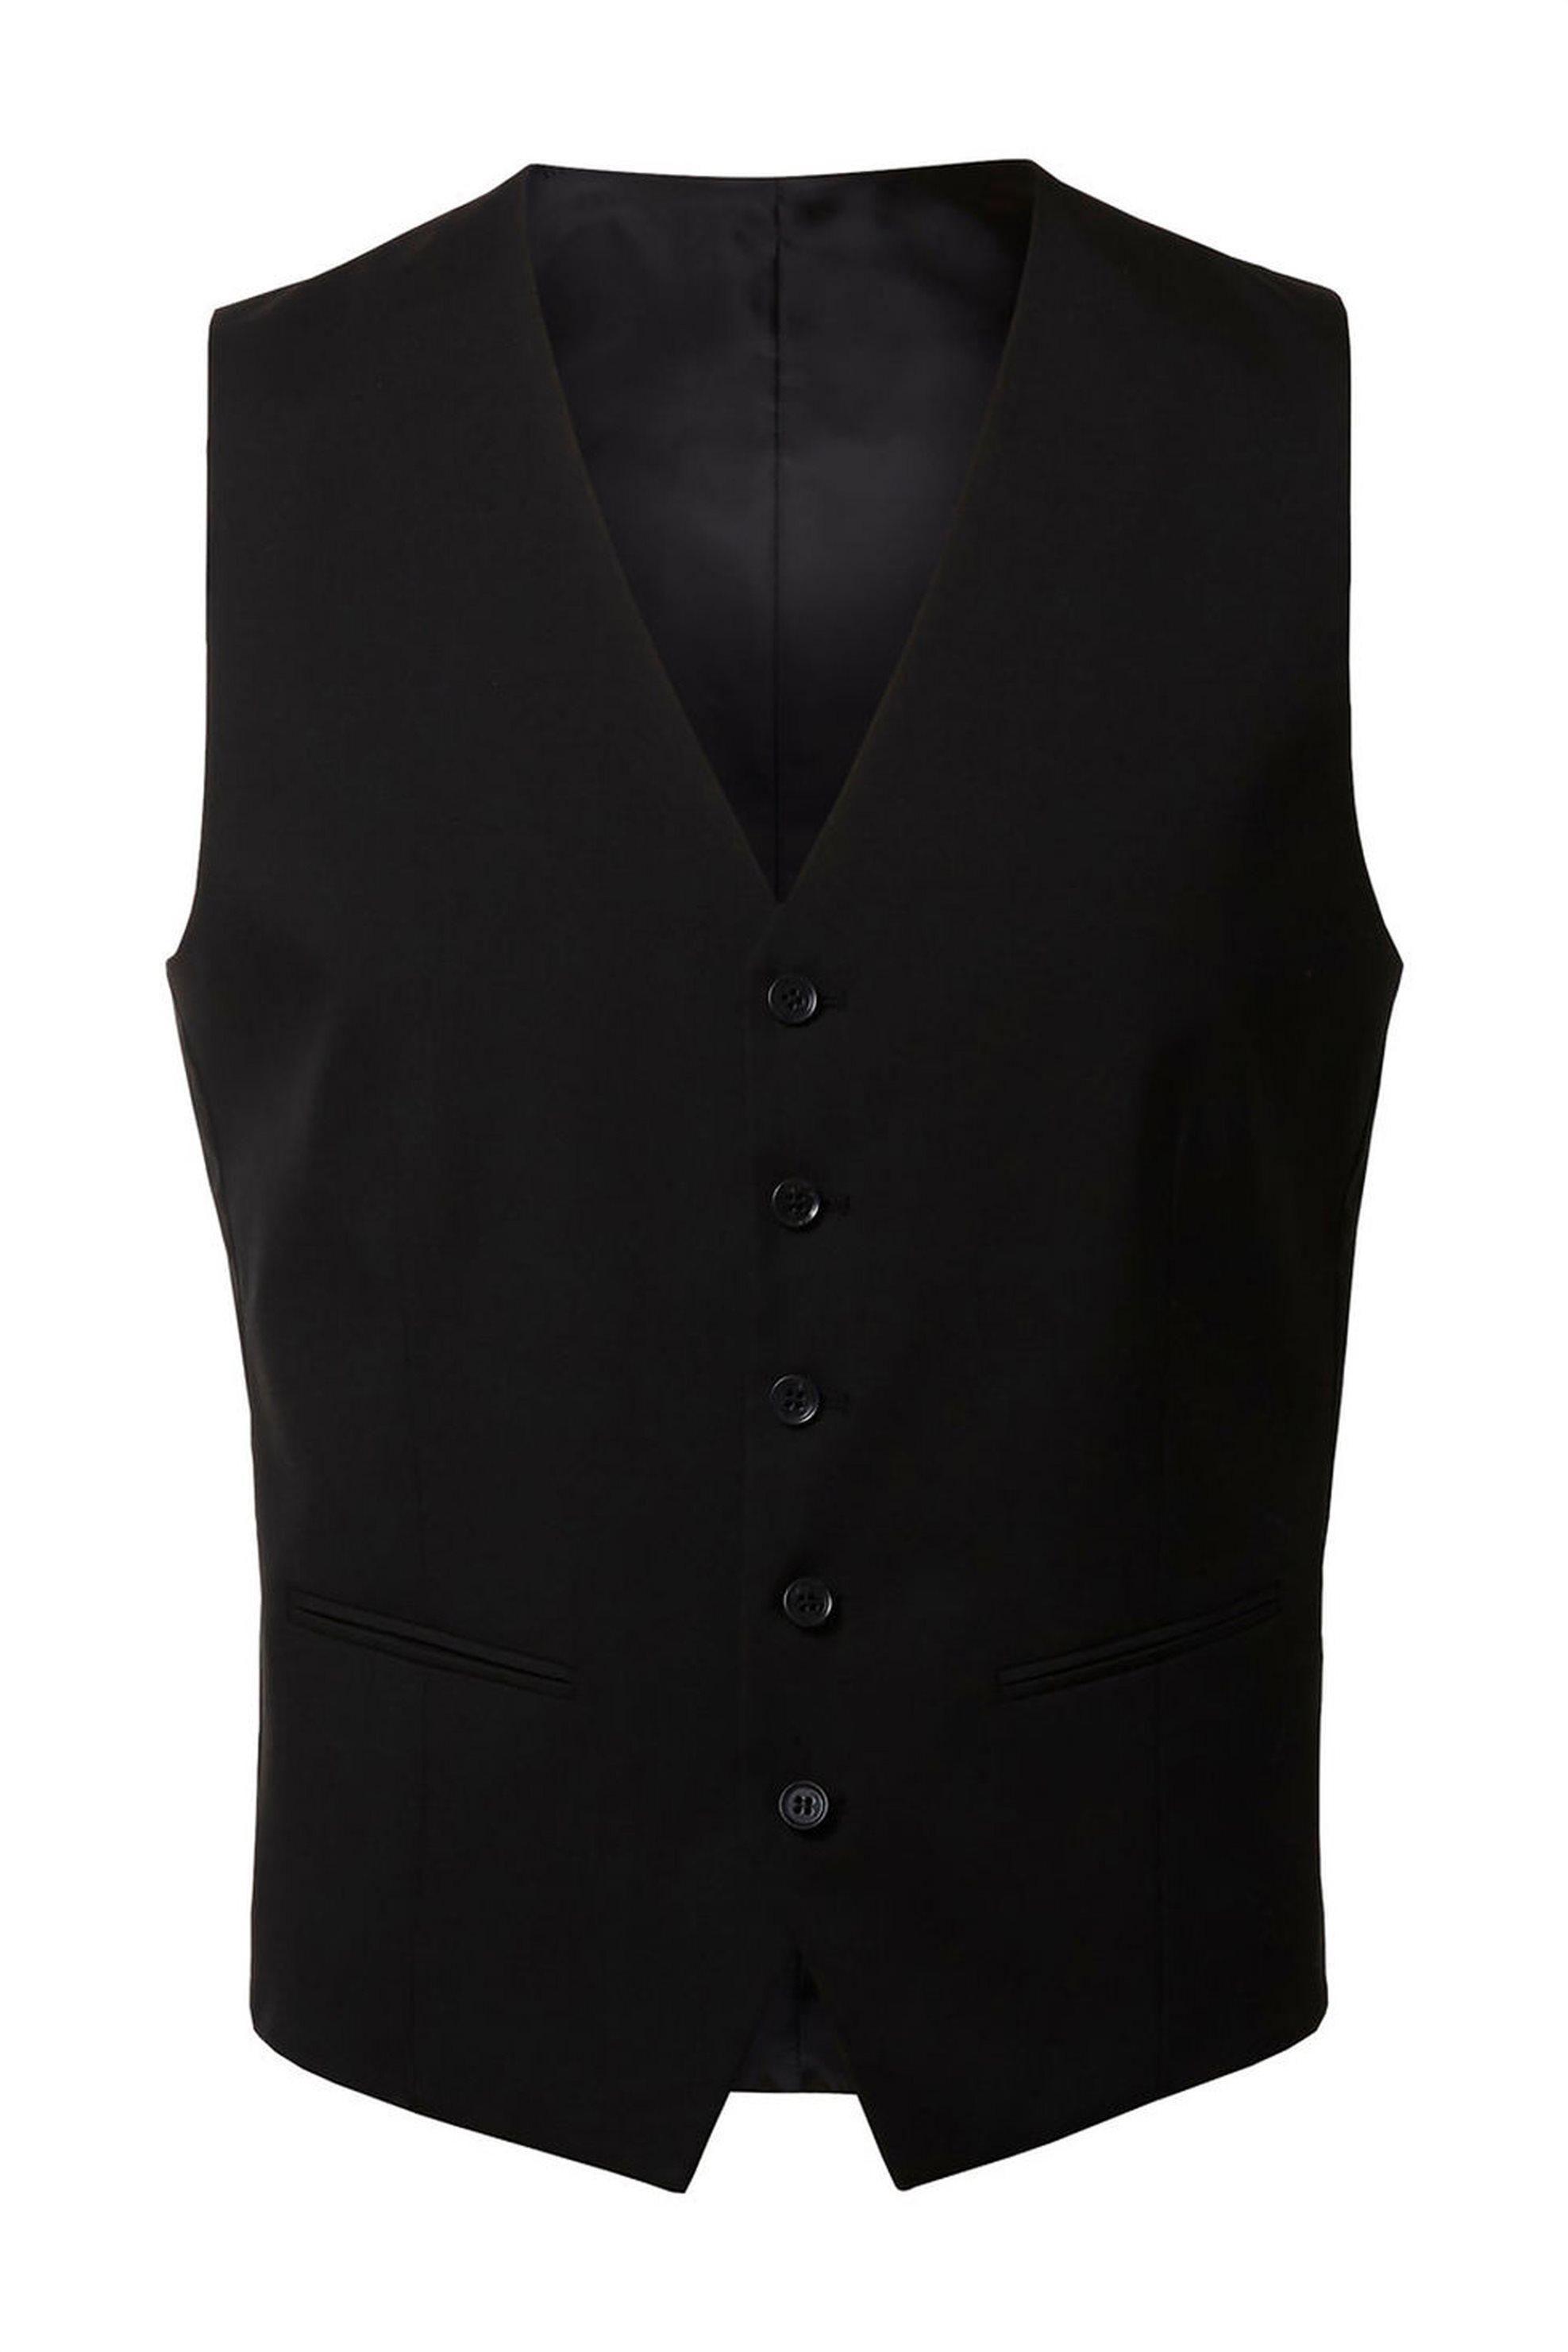 SELECTED ανδρικό γιλέκο με κουμπιά Slim fit - 16052660 - Μαύρο ανδρασ   ρουχα   κοστούμια   γιλέκα